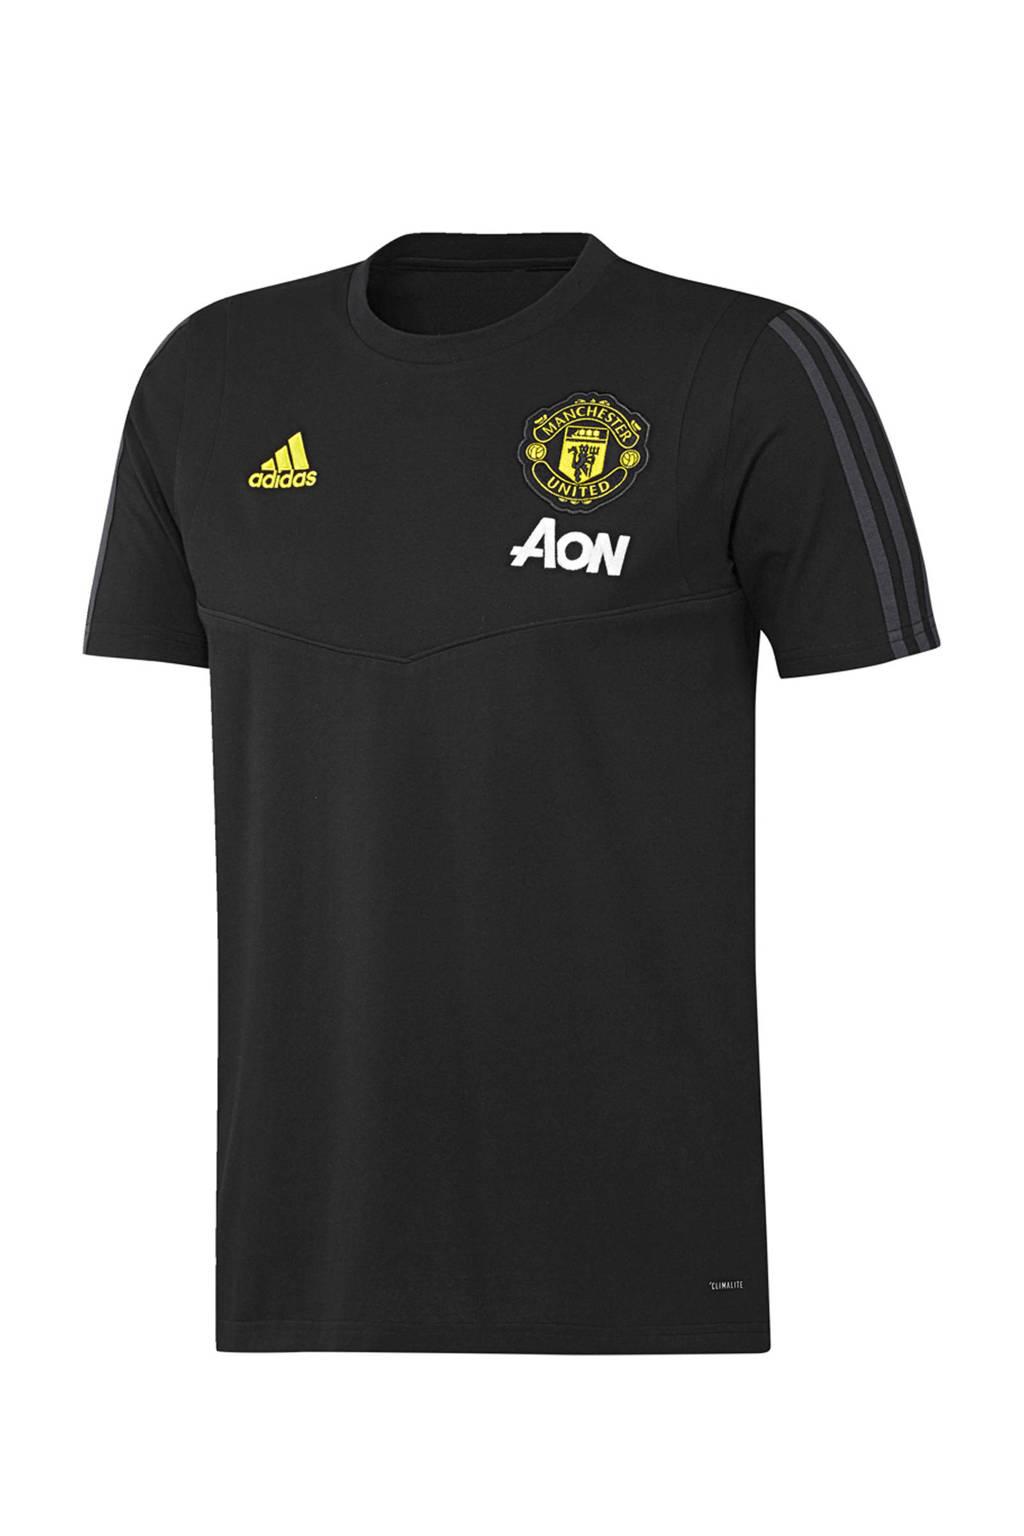 adidas Senior Manchester United voetbalshirt, Zwart/grijs